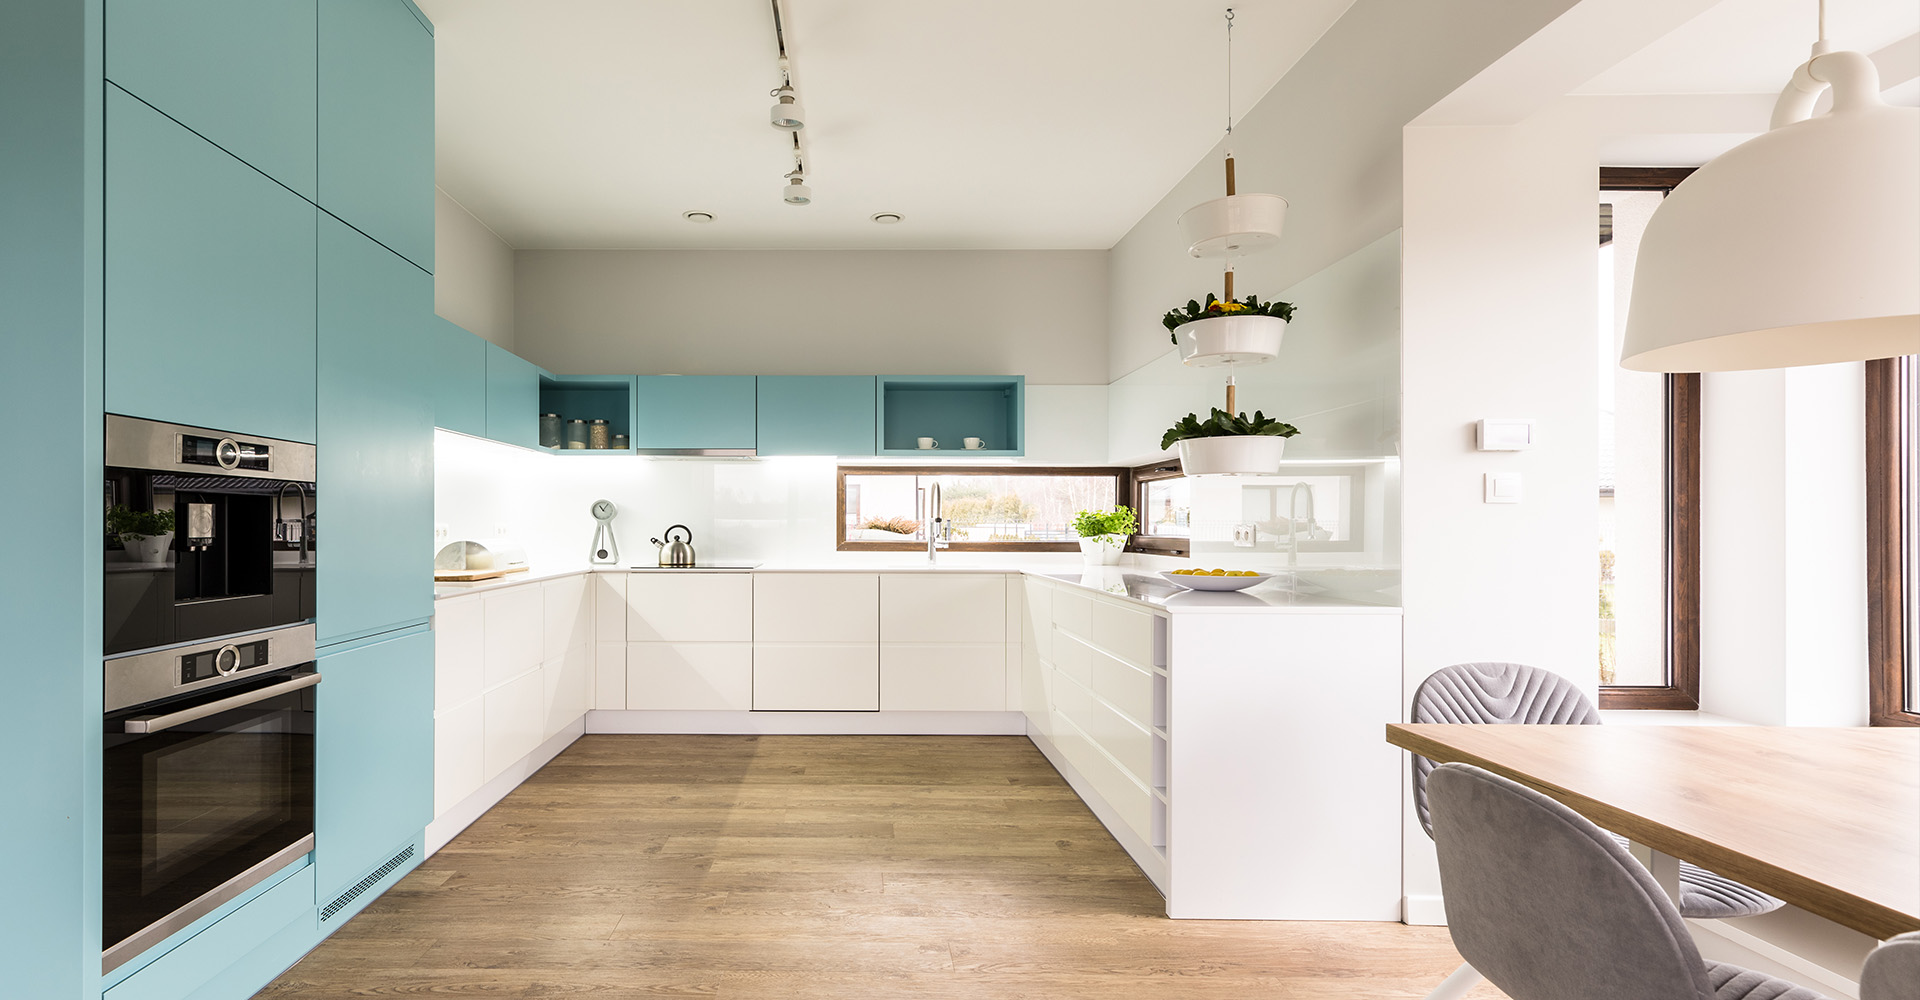 Top Kitchen Interior designers in Bangalore